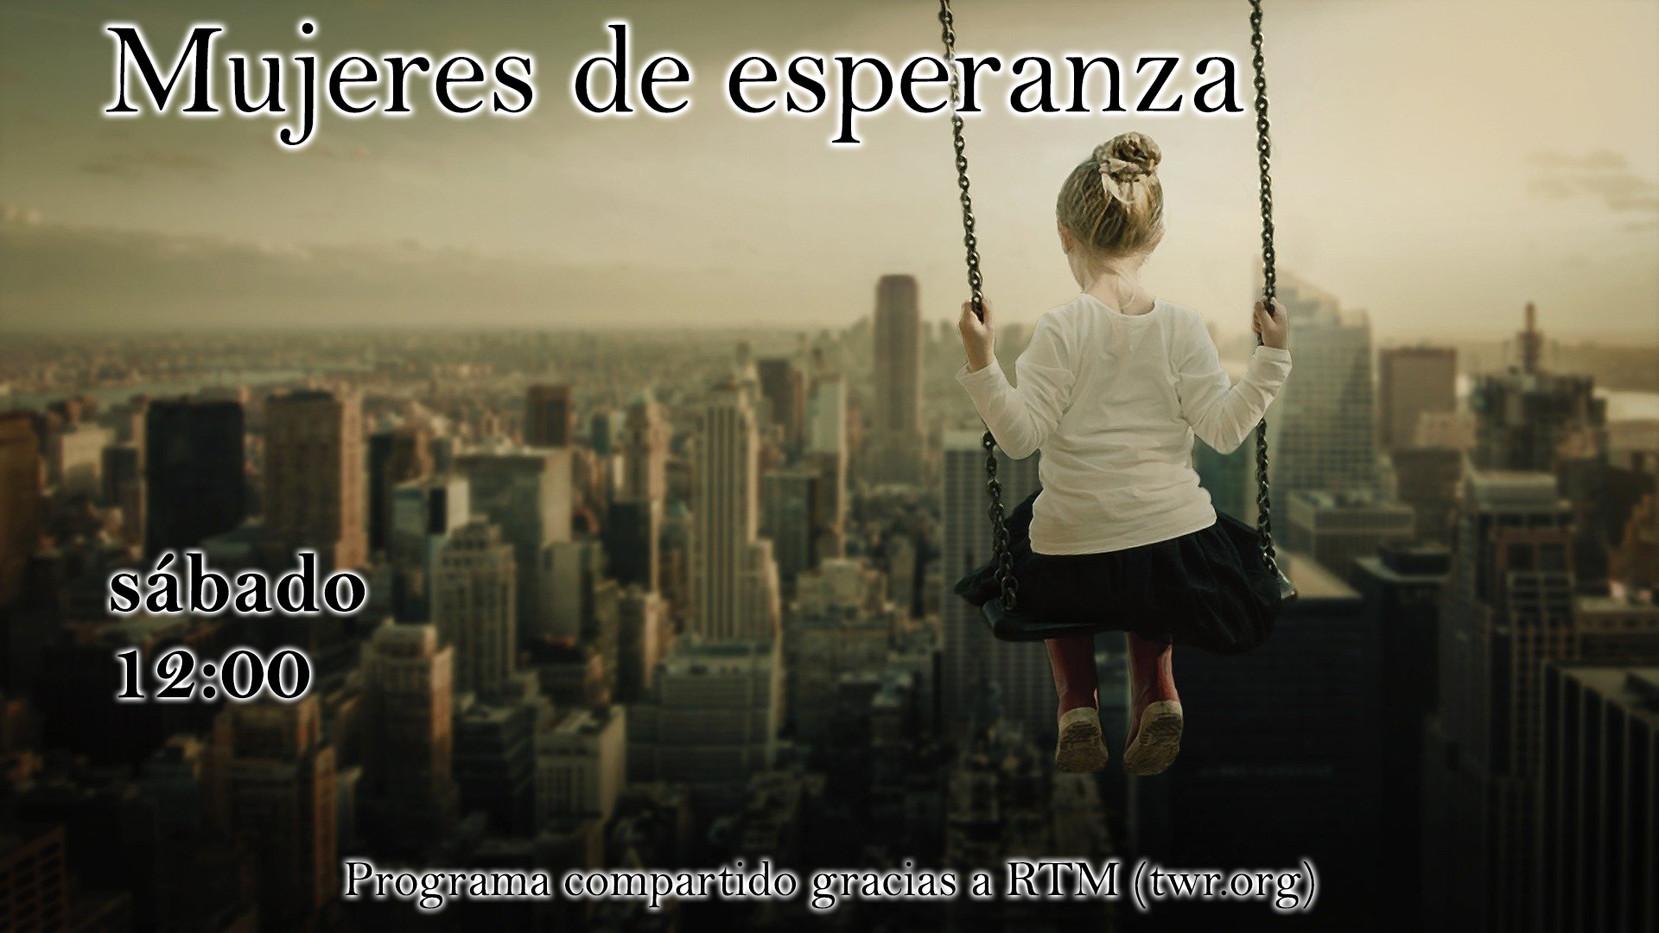 galeria_mujeres de esperanza.jpg